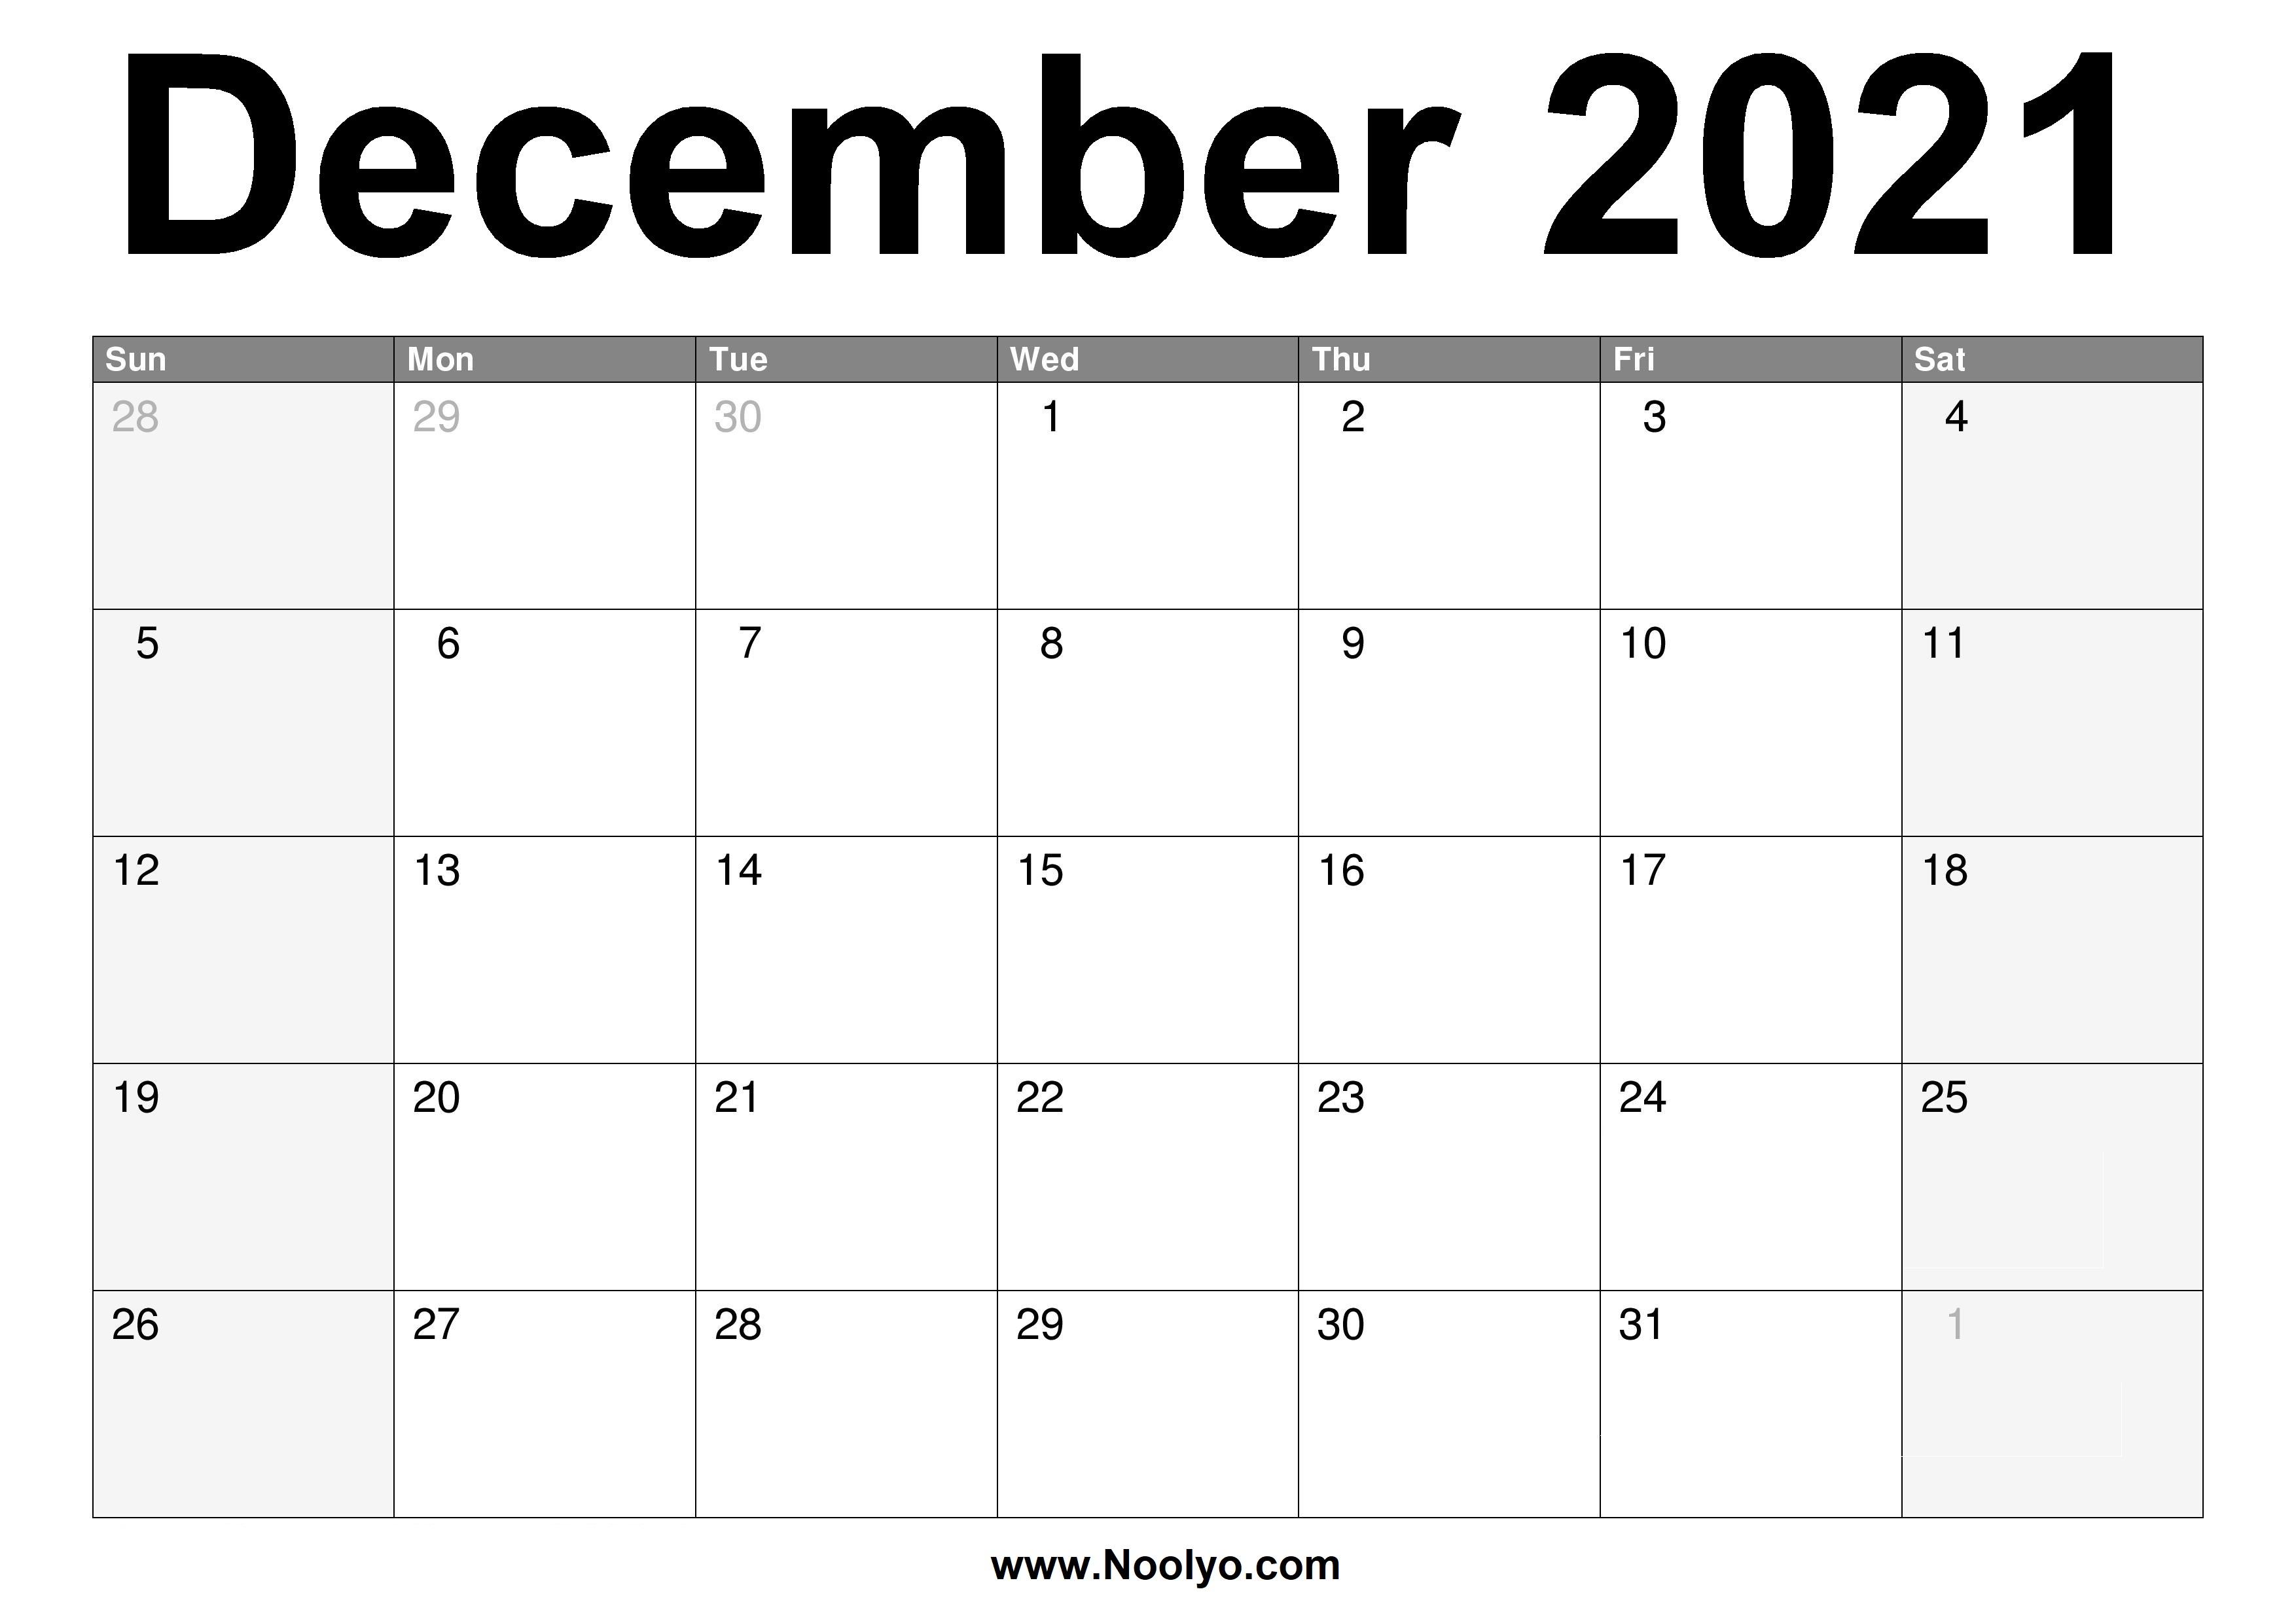 December Monthly Calendar 2021 December 2021 Calendar Printable – Free Download – Noolyo.com